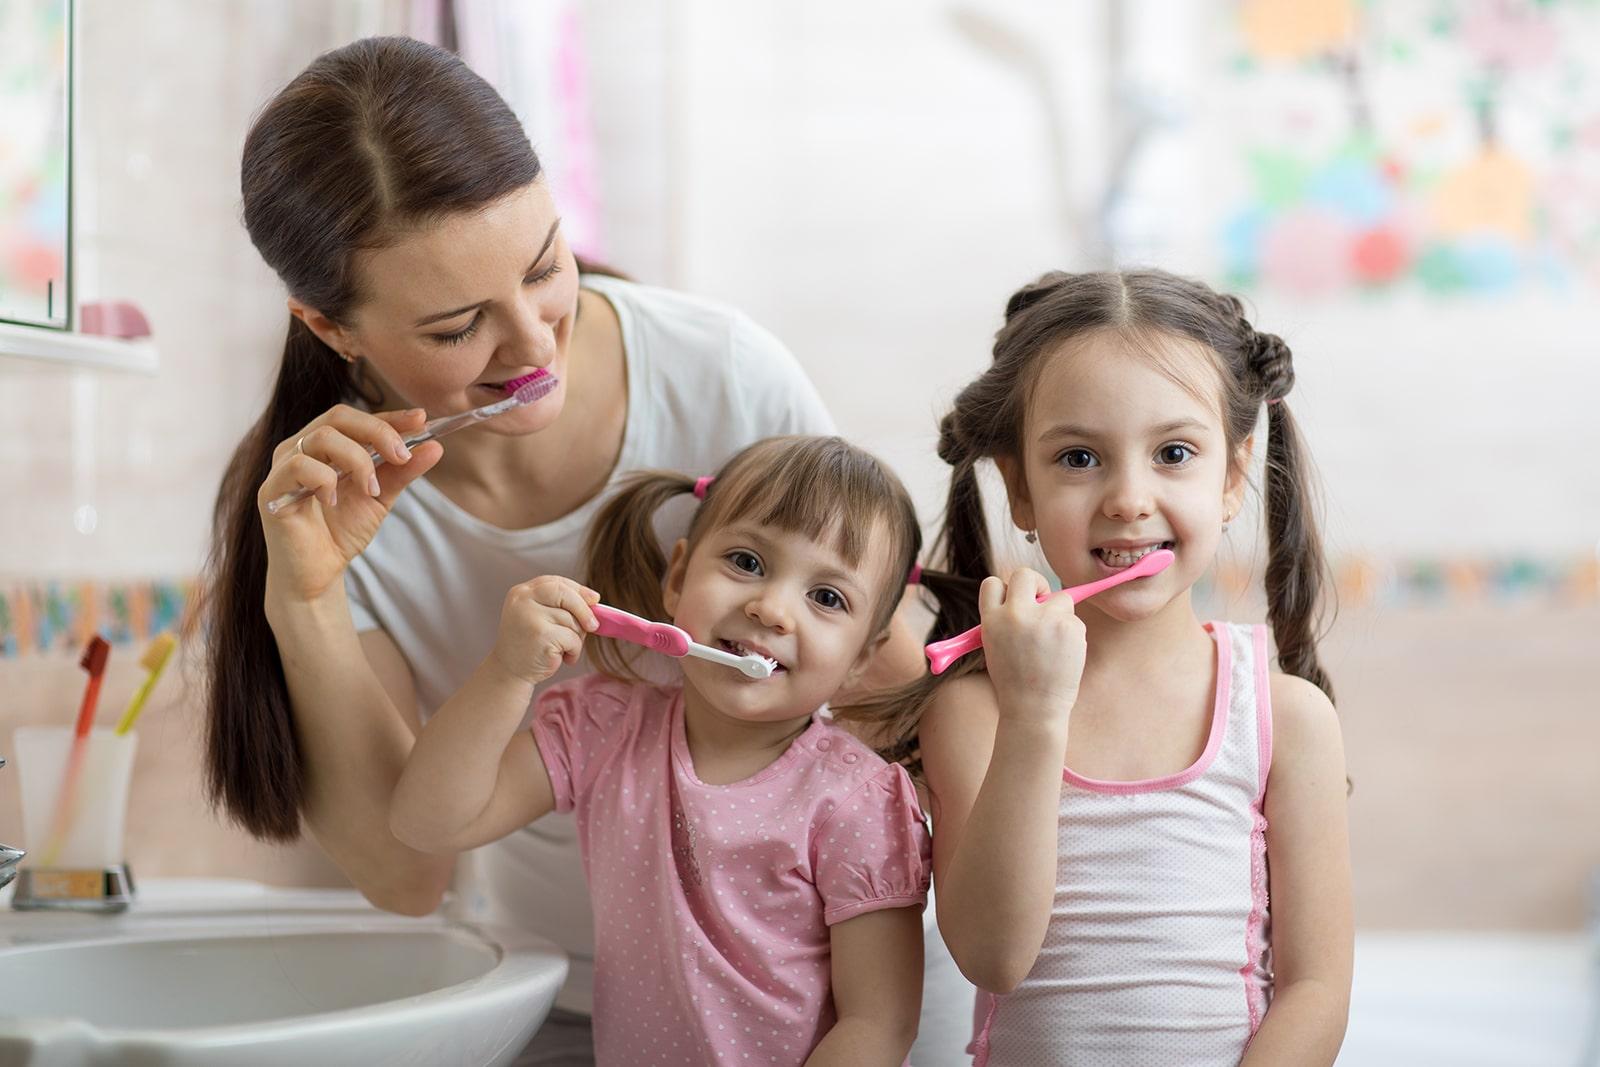 Ask Your Port Lavaca Dentist: October is National Dental Hygiene Month